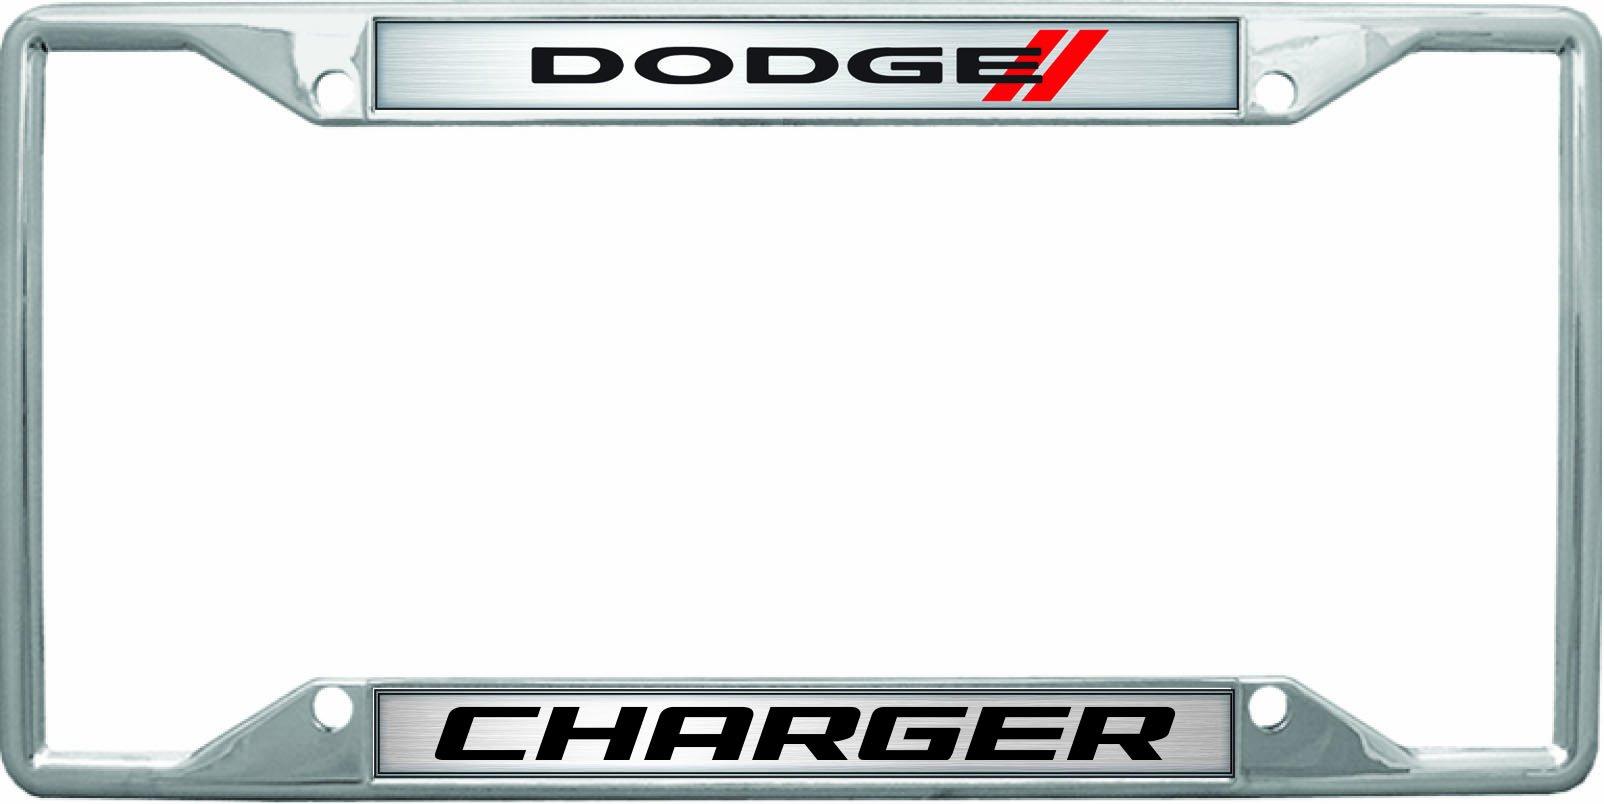 Eurosport Daytona DodgeCharger License Plate